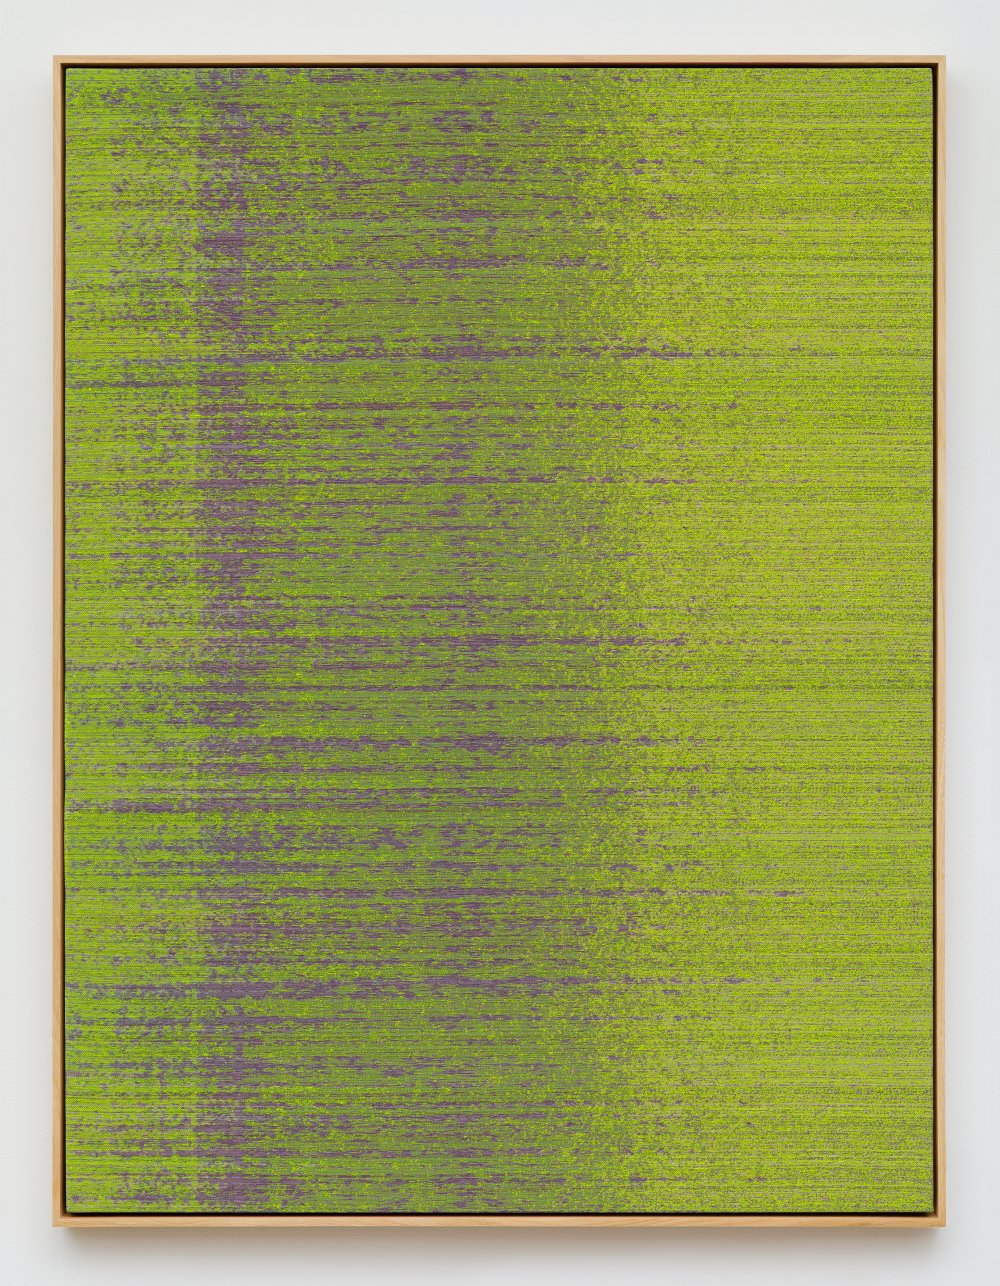 Negative Entropy (Digital Ocean NYC2, 4U NAS Unit, Fluorescent Green, Single)